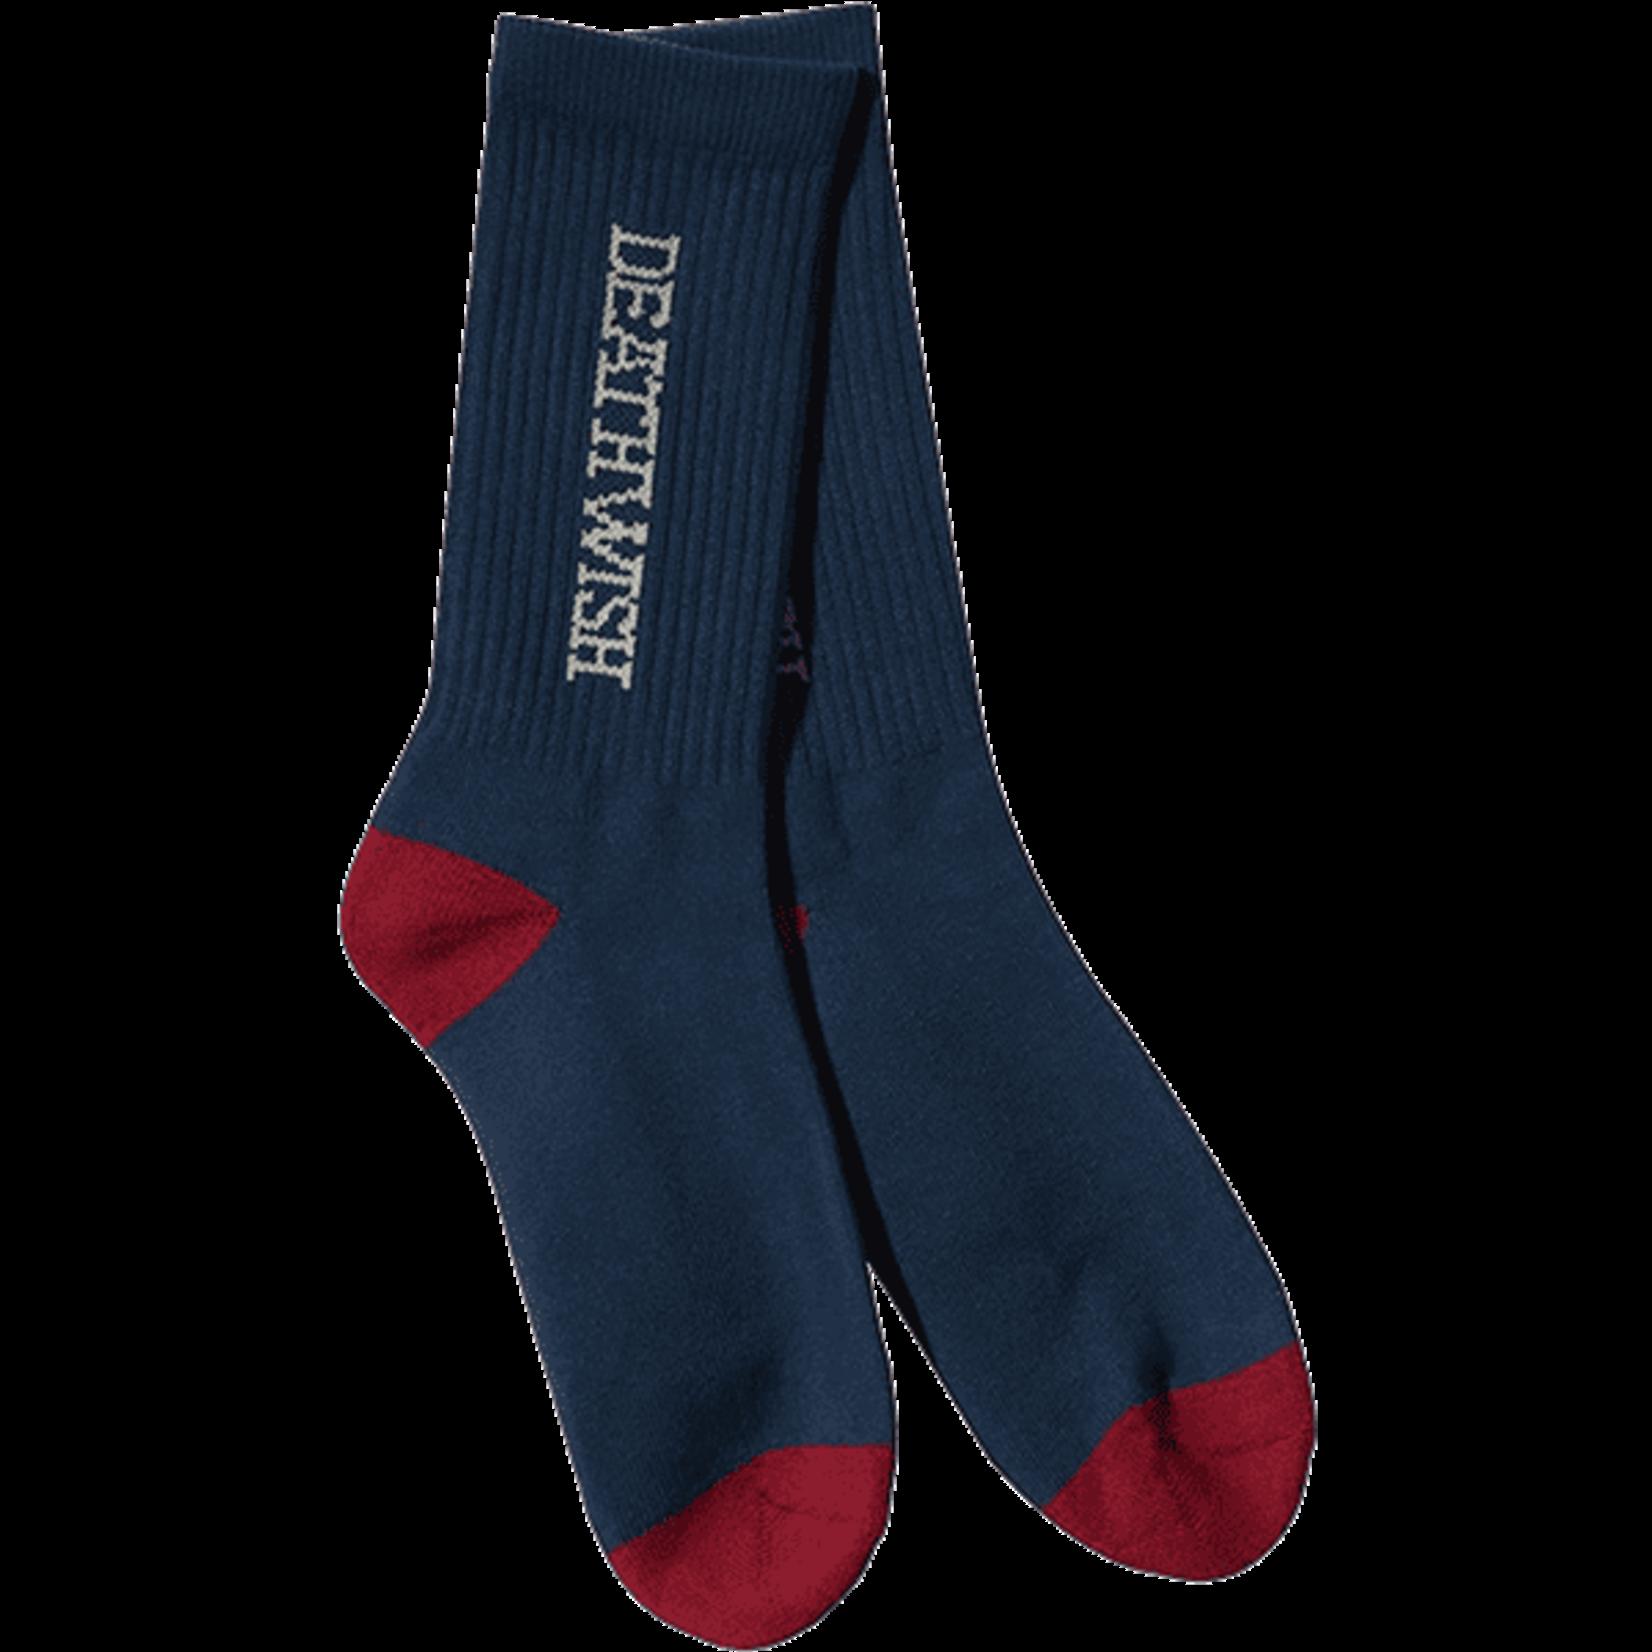 Deathwish Deathwish Antidote Crew Socks, Navy/Red, OSFA